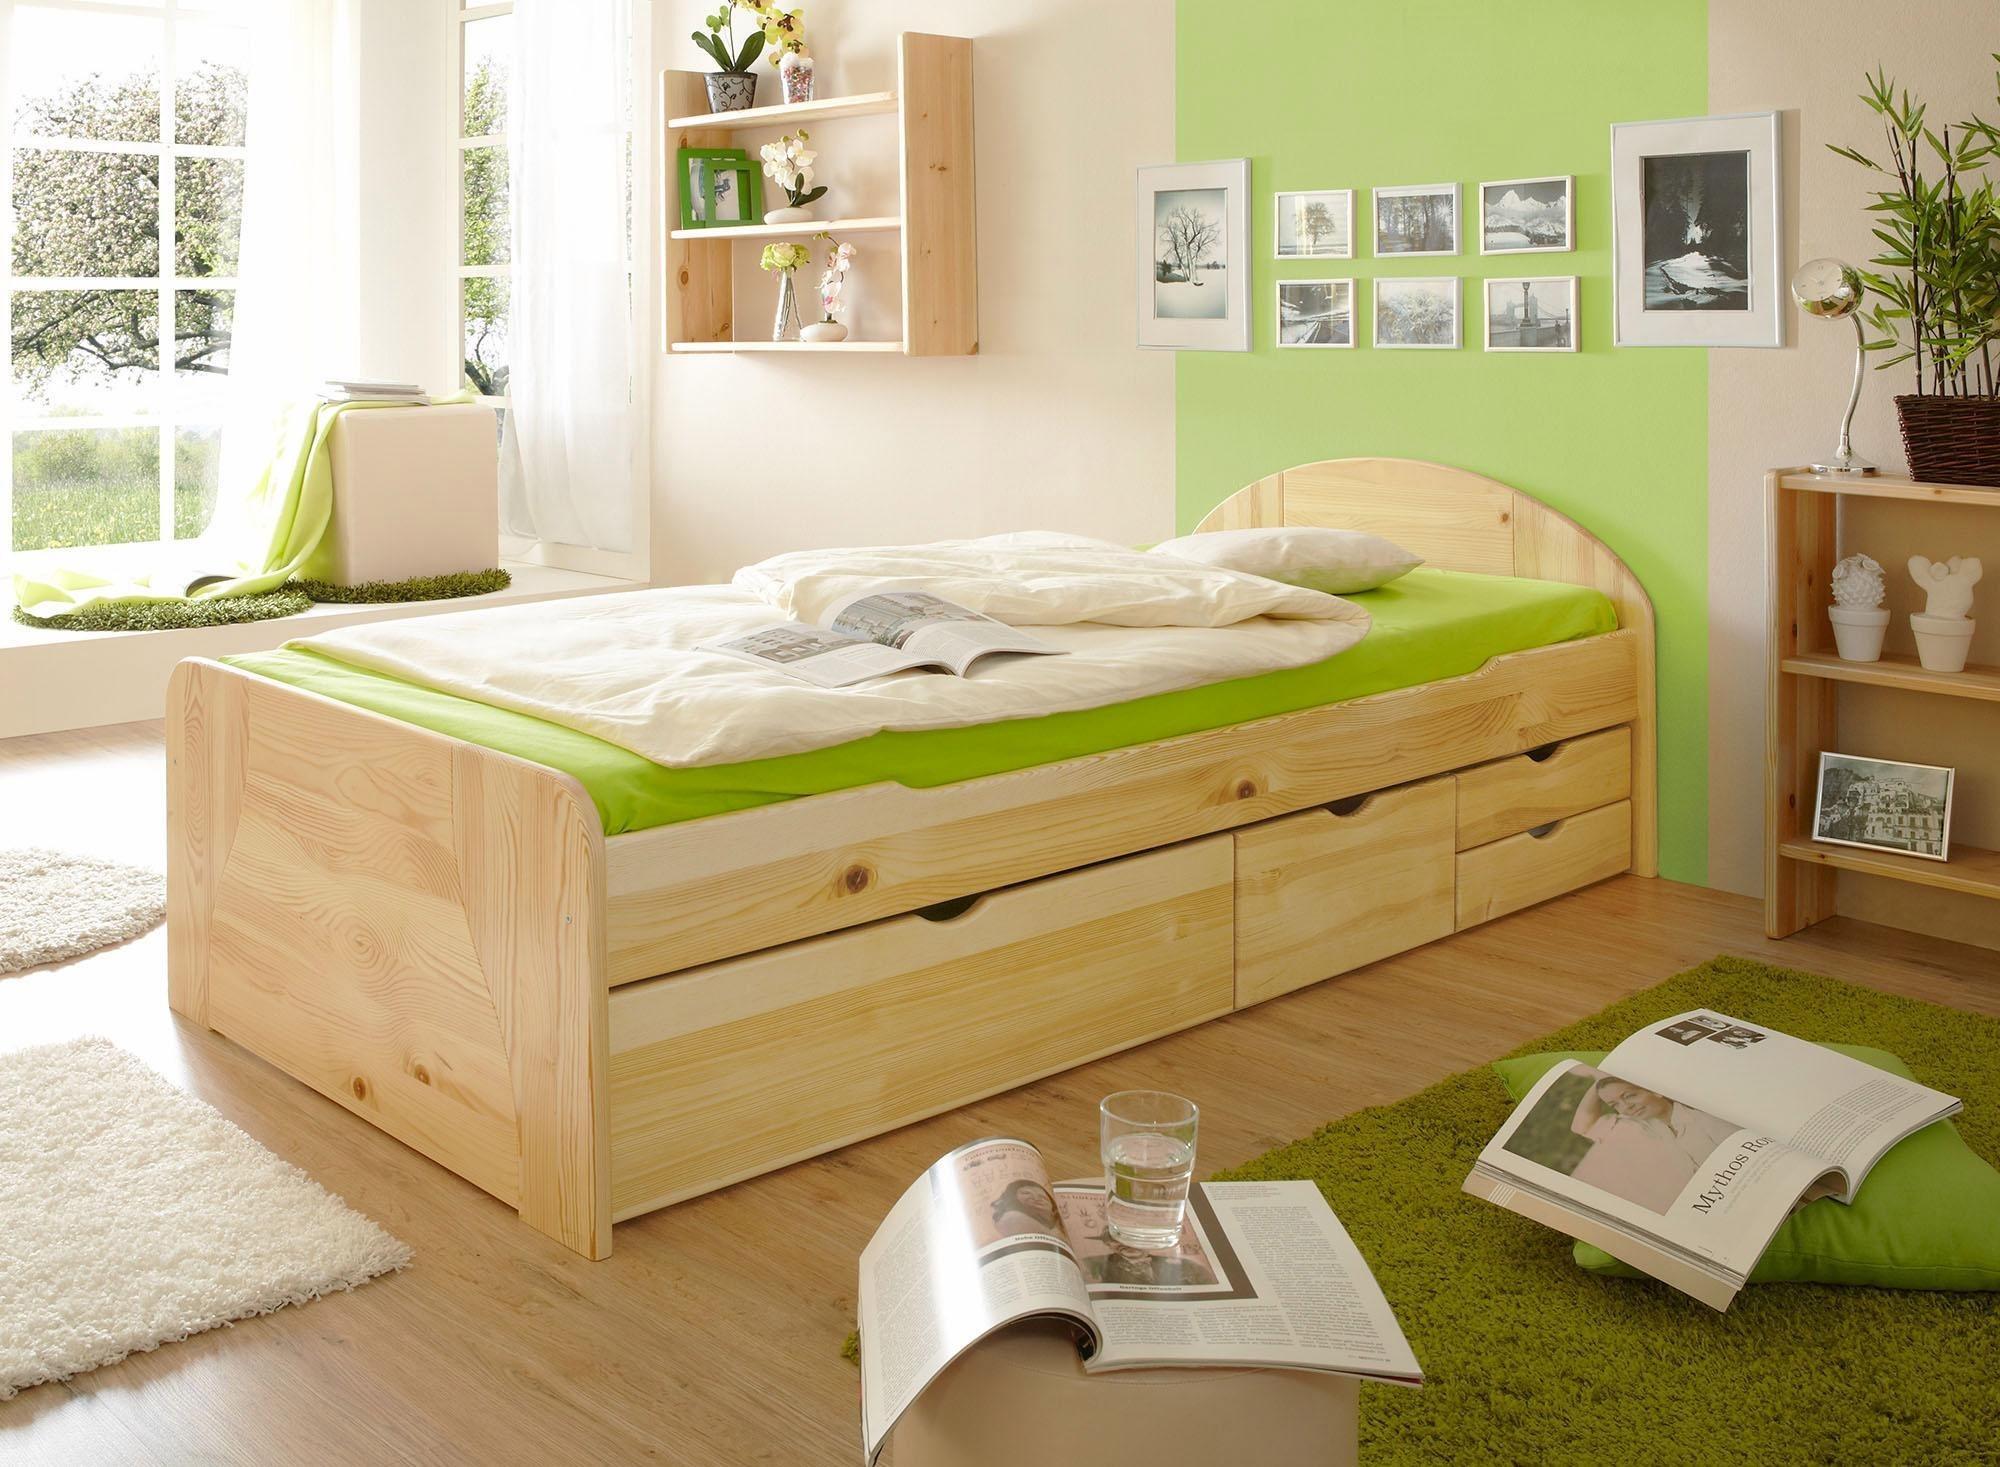 ticaa bett erna in 3 breiten mit bettschubk sten kiefer natur liegefl che 100x200 cm online. Black Bedroom Furniture Sets. Home Design Ideas